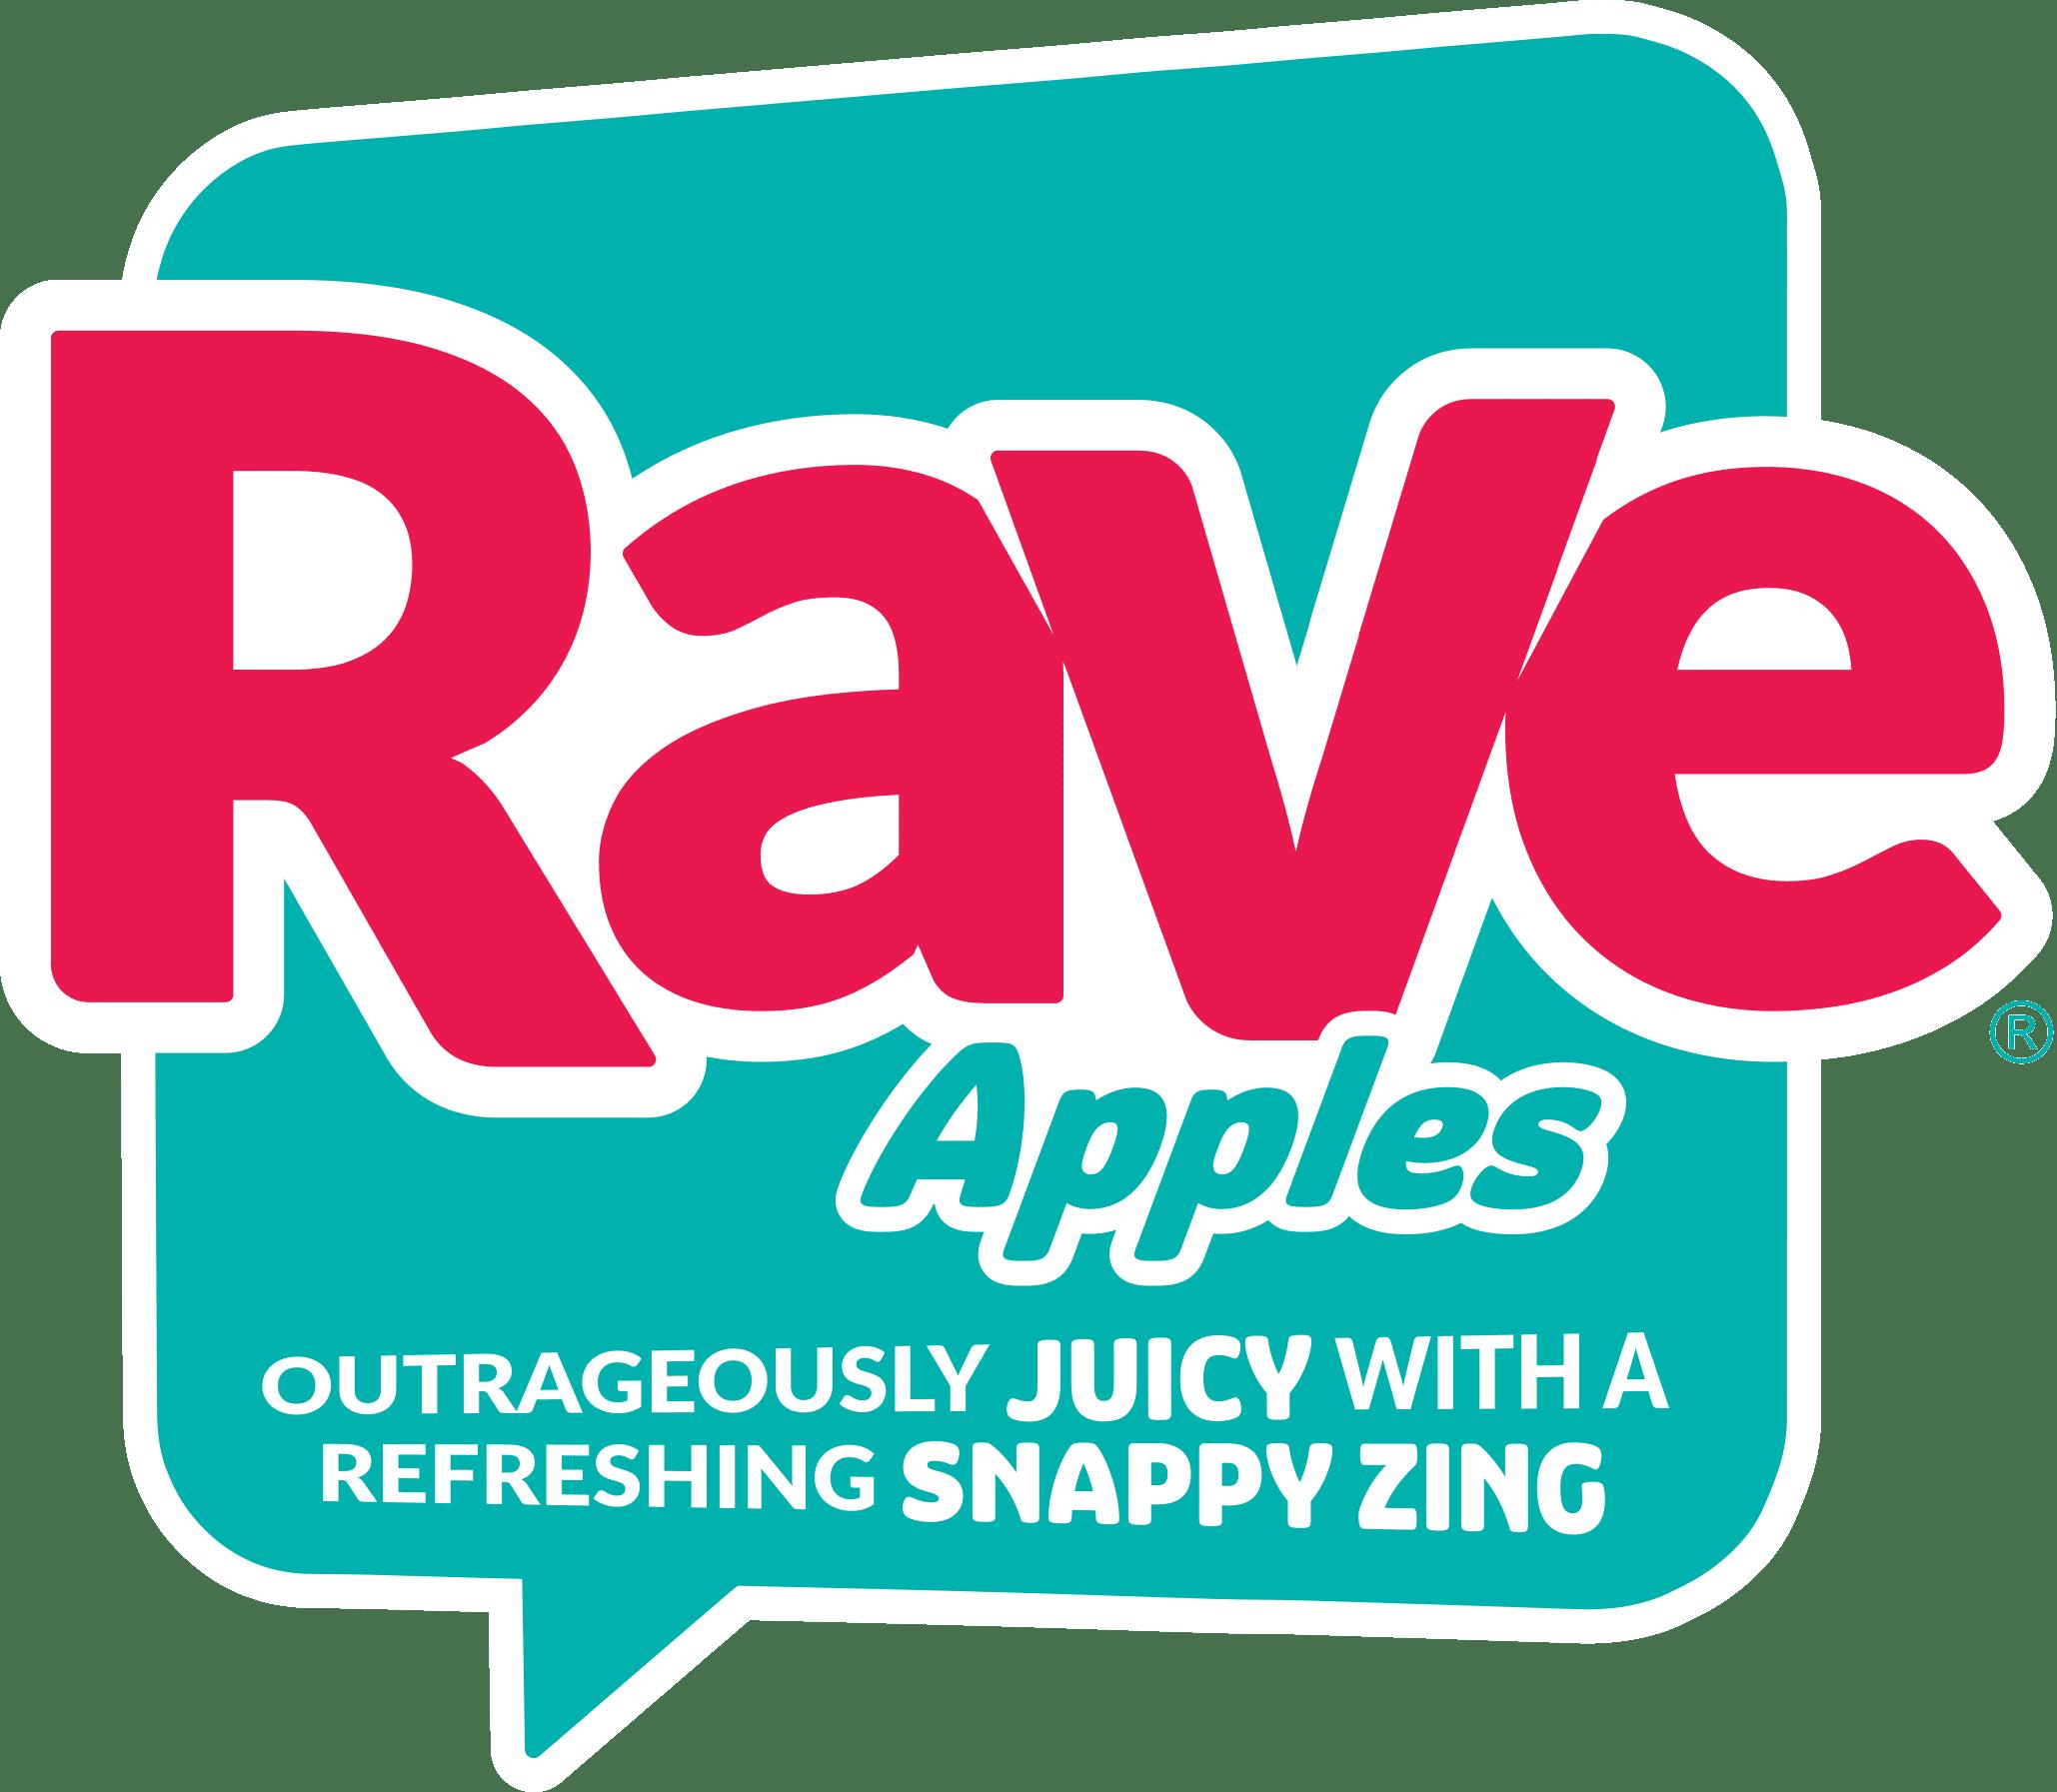 Rave Apples logo